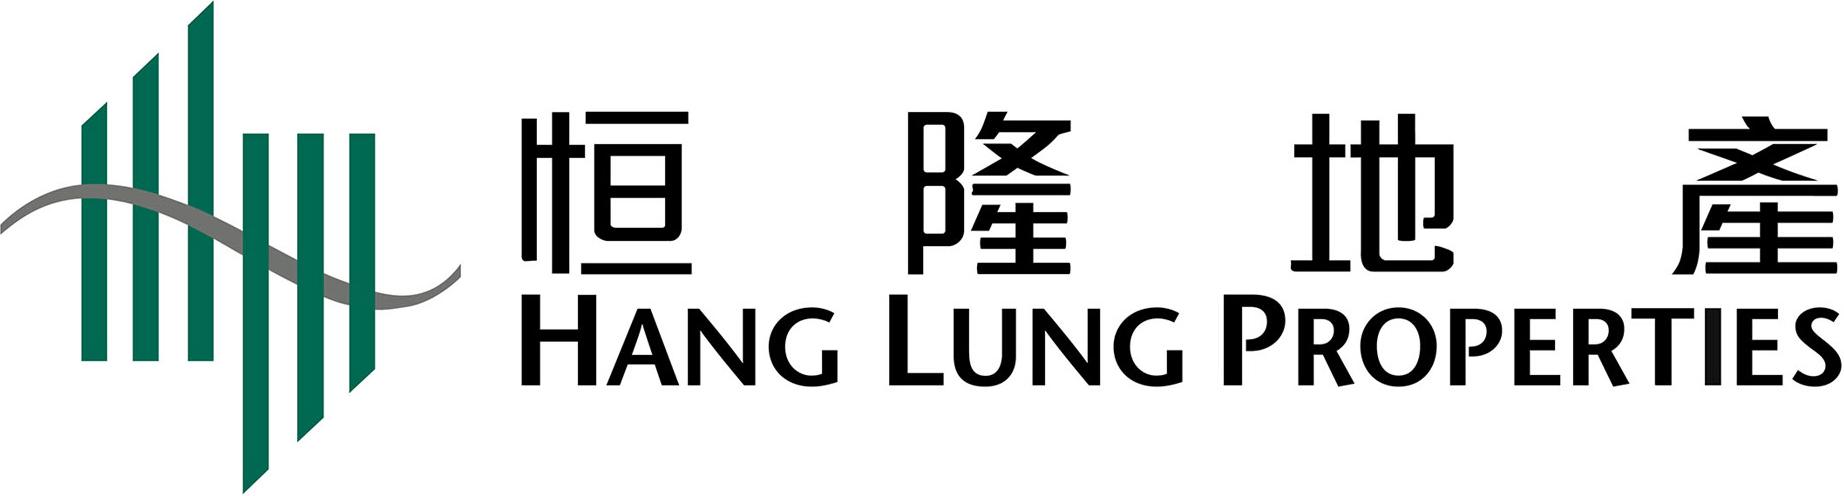 Heng Lung.png